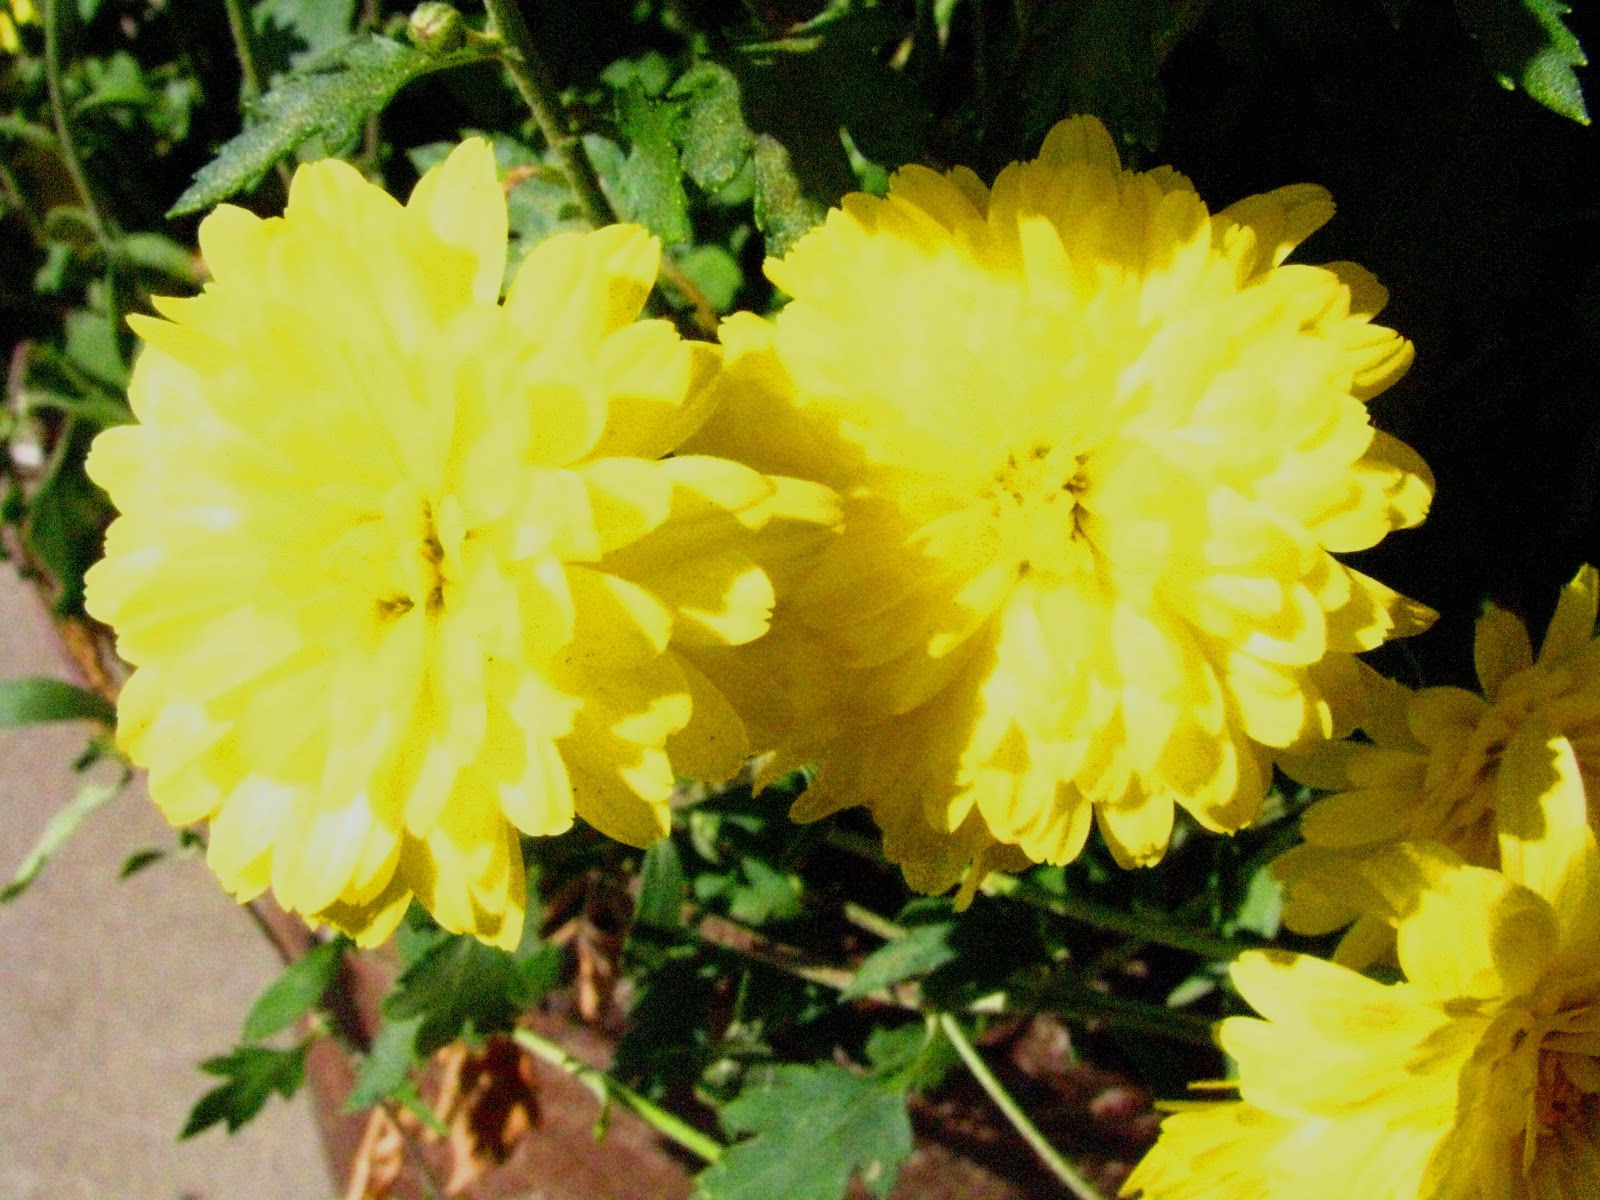 Angelgirlpj Chrysanthemums or Mums